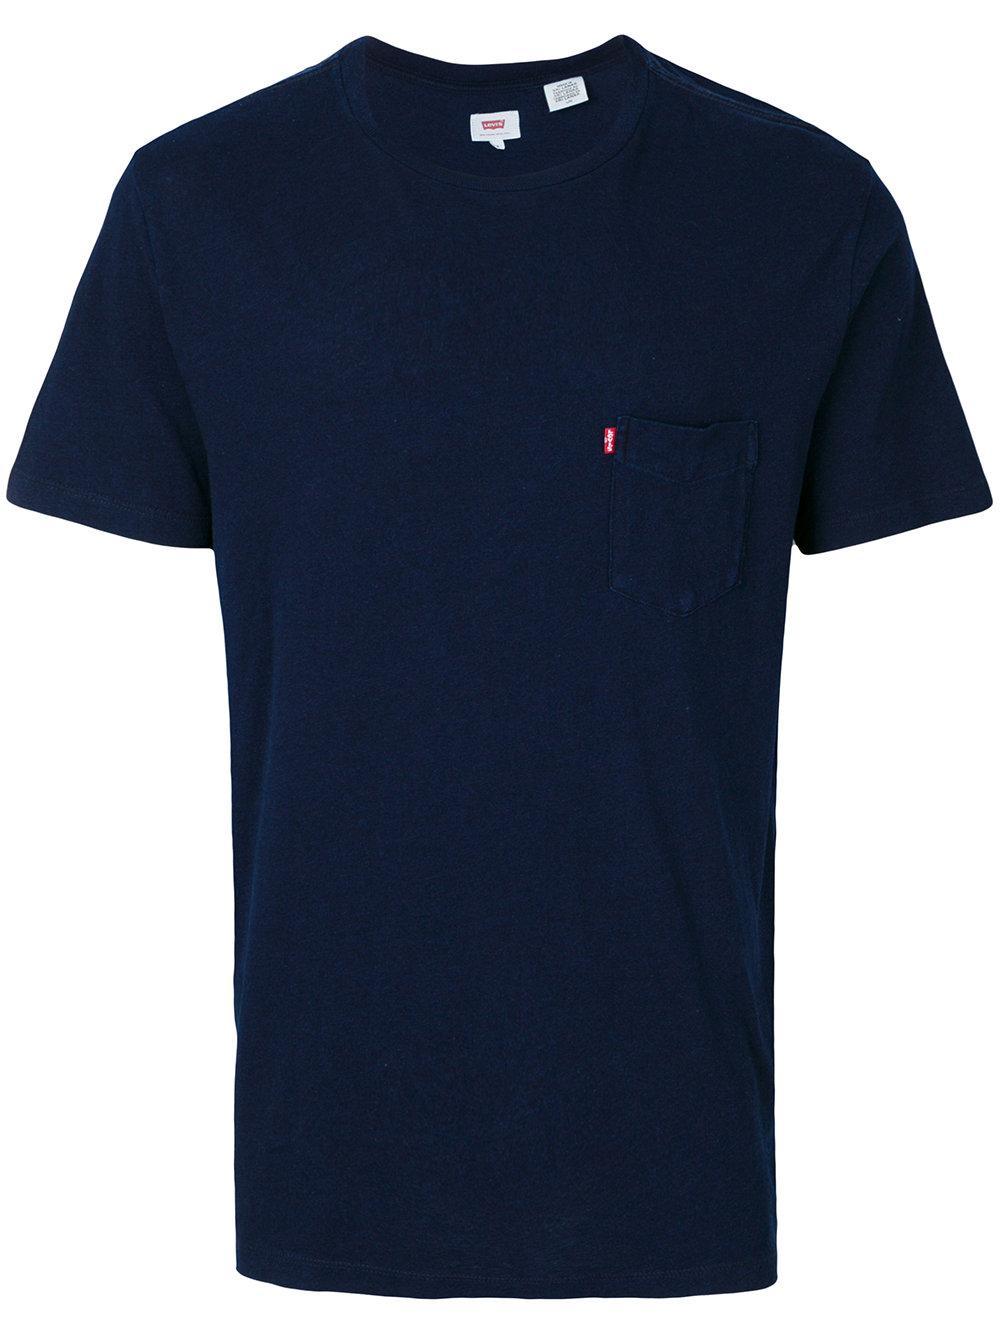 Lyst - Levi's Pocket T-shirt in Blue for Men